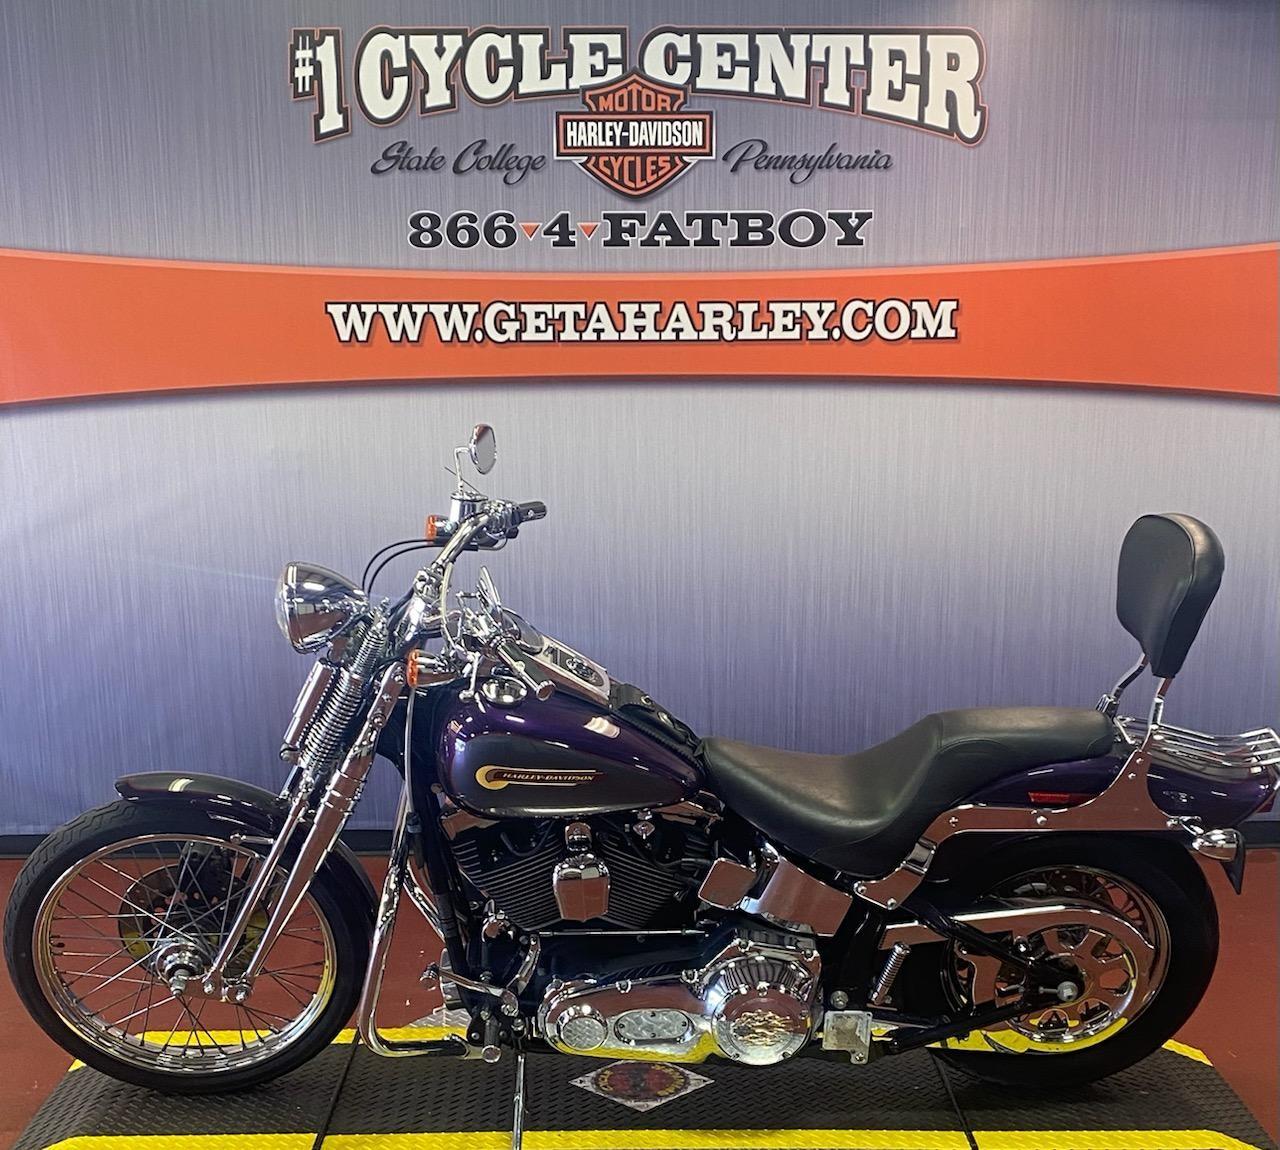 2004 Harley-Davidson Softail Springer Softail at #1 Cycle Center Harley-Davidson